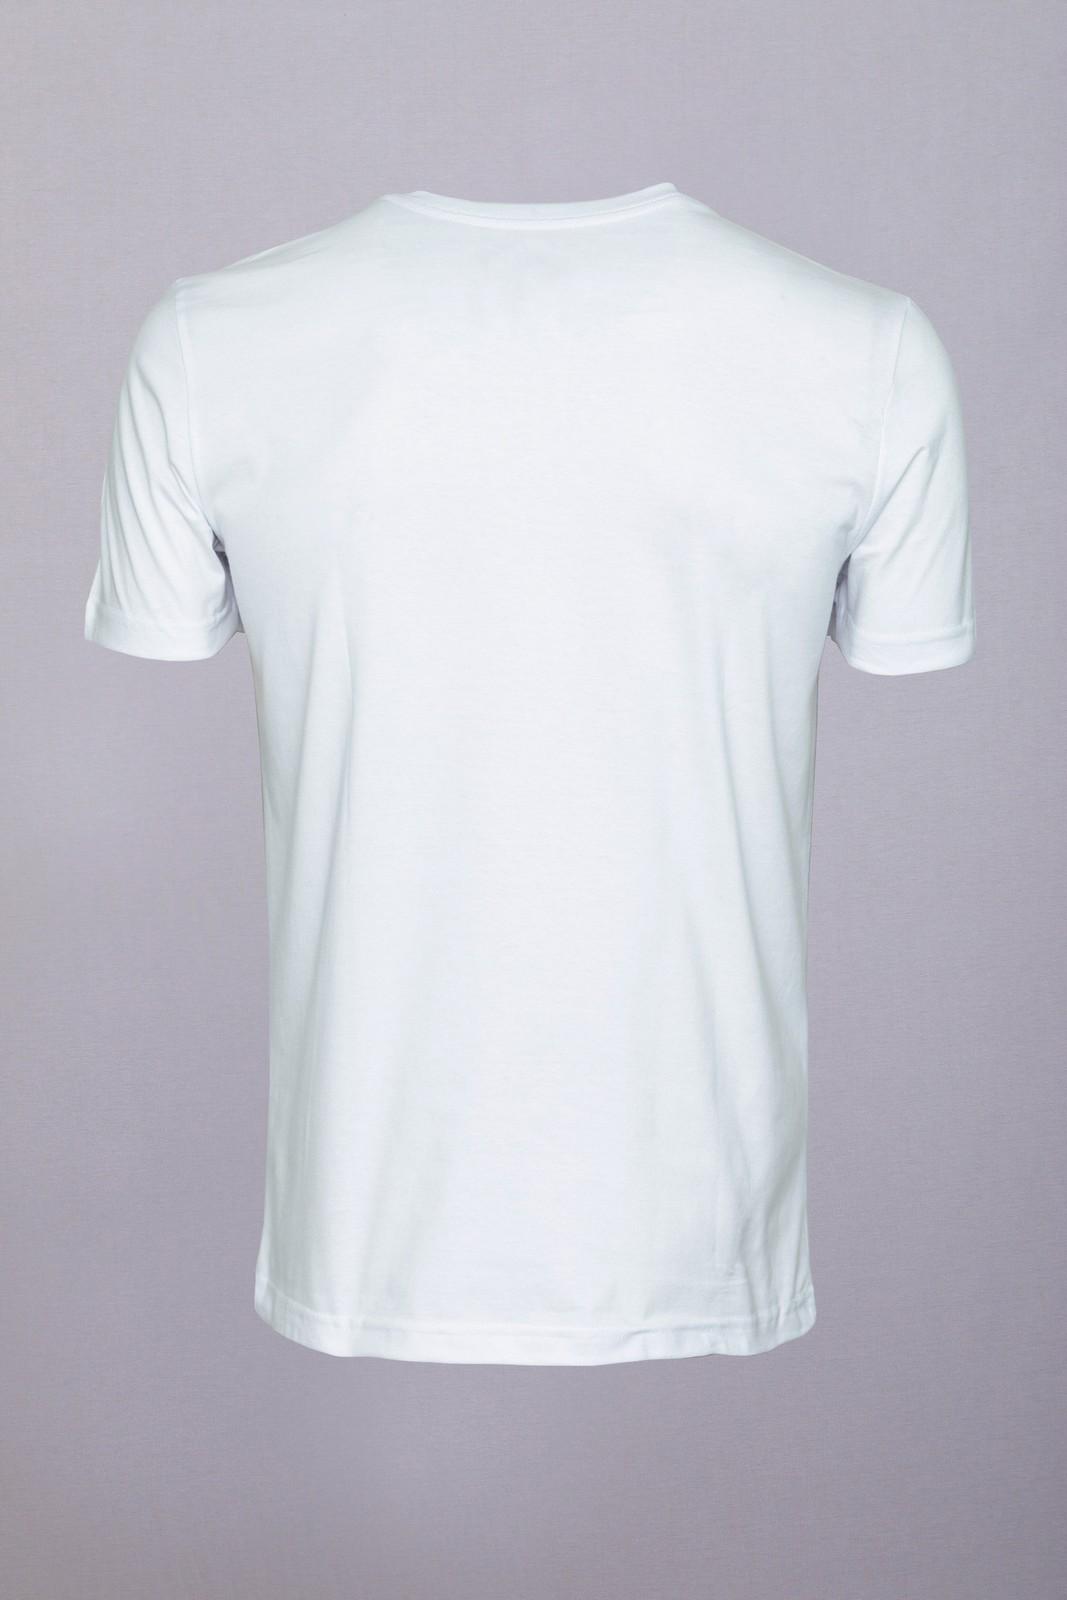 Camiseta Barrocco Always It Simple Branca